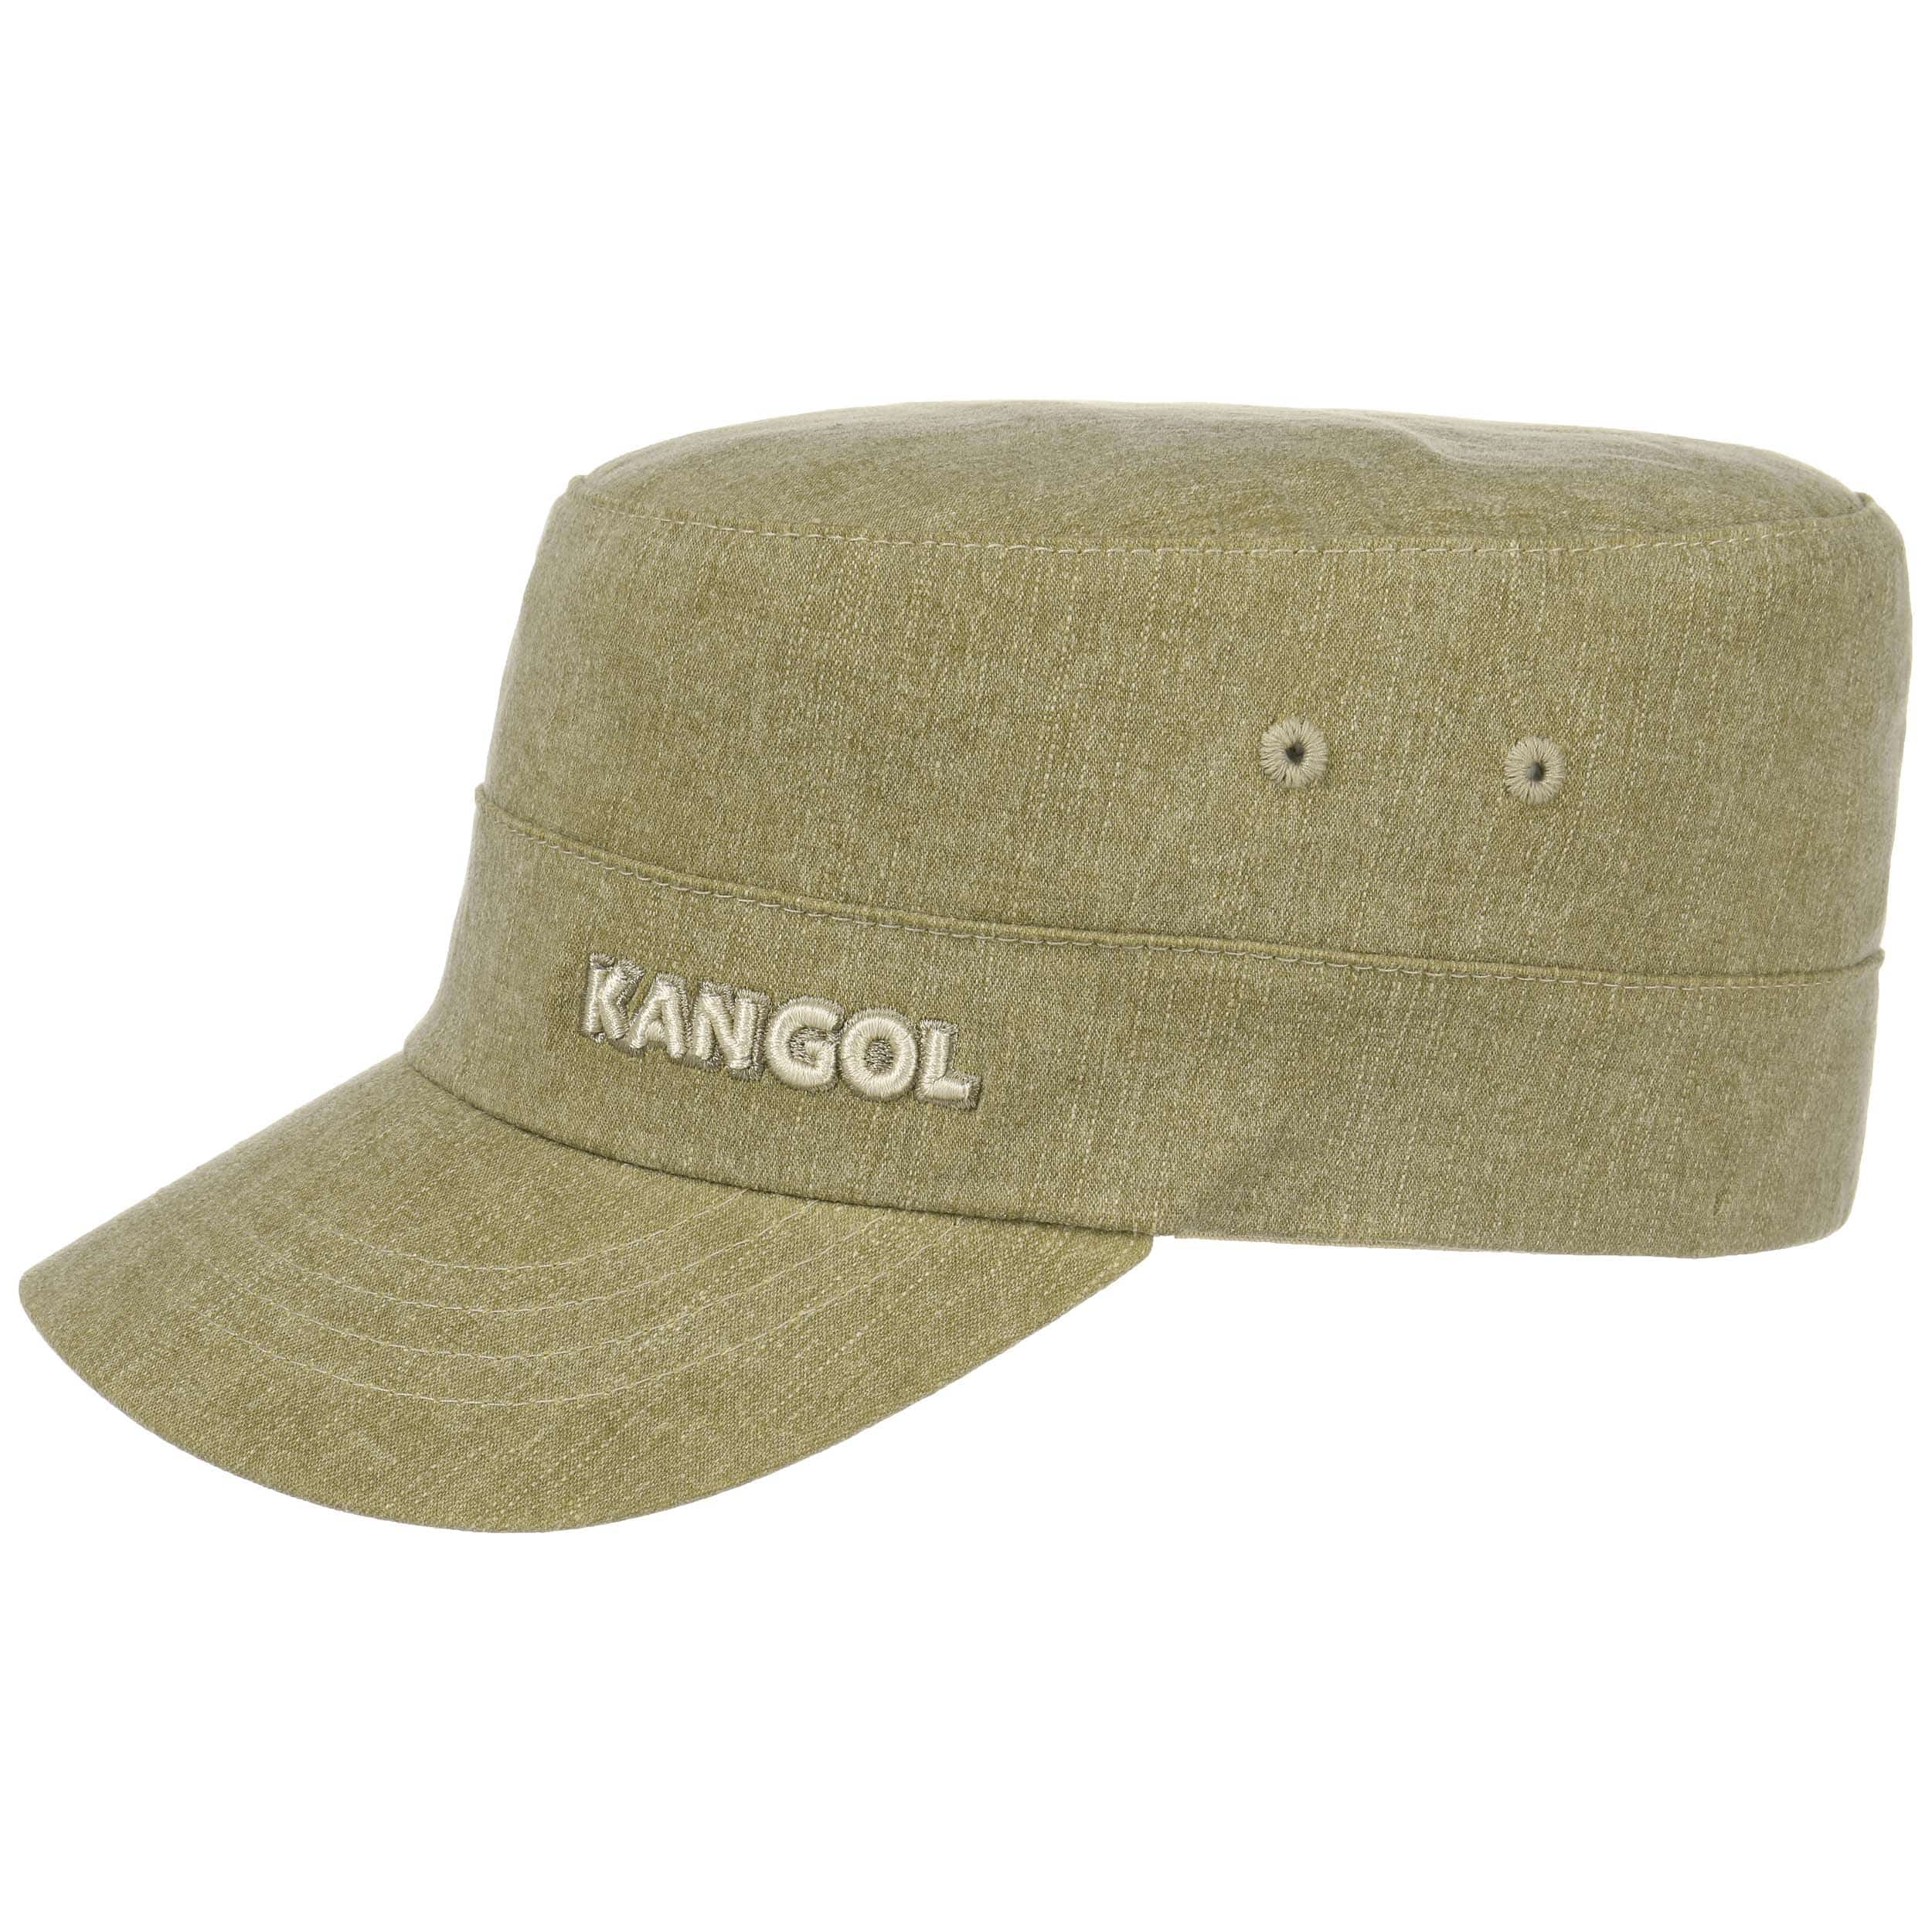 kangol flexfit denim army cap 4200